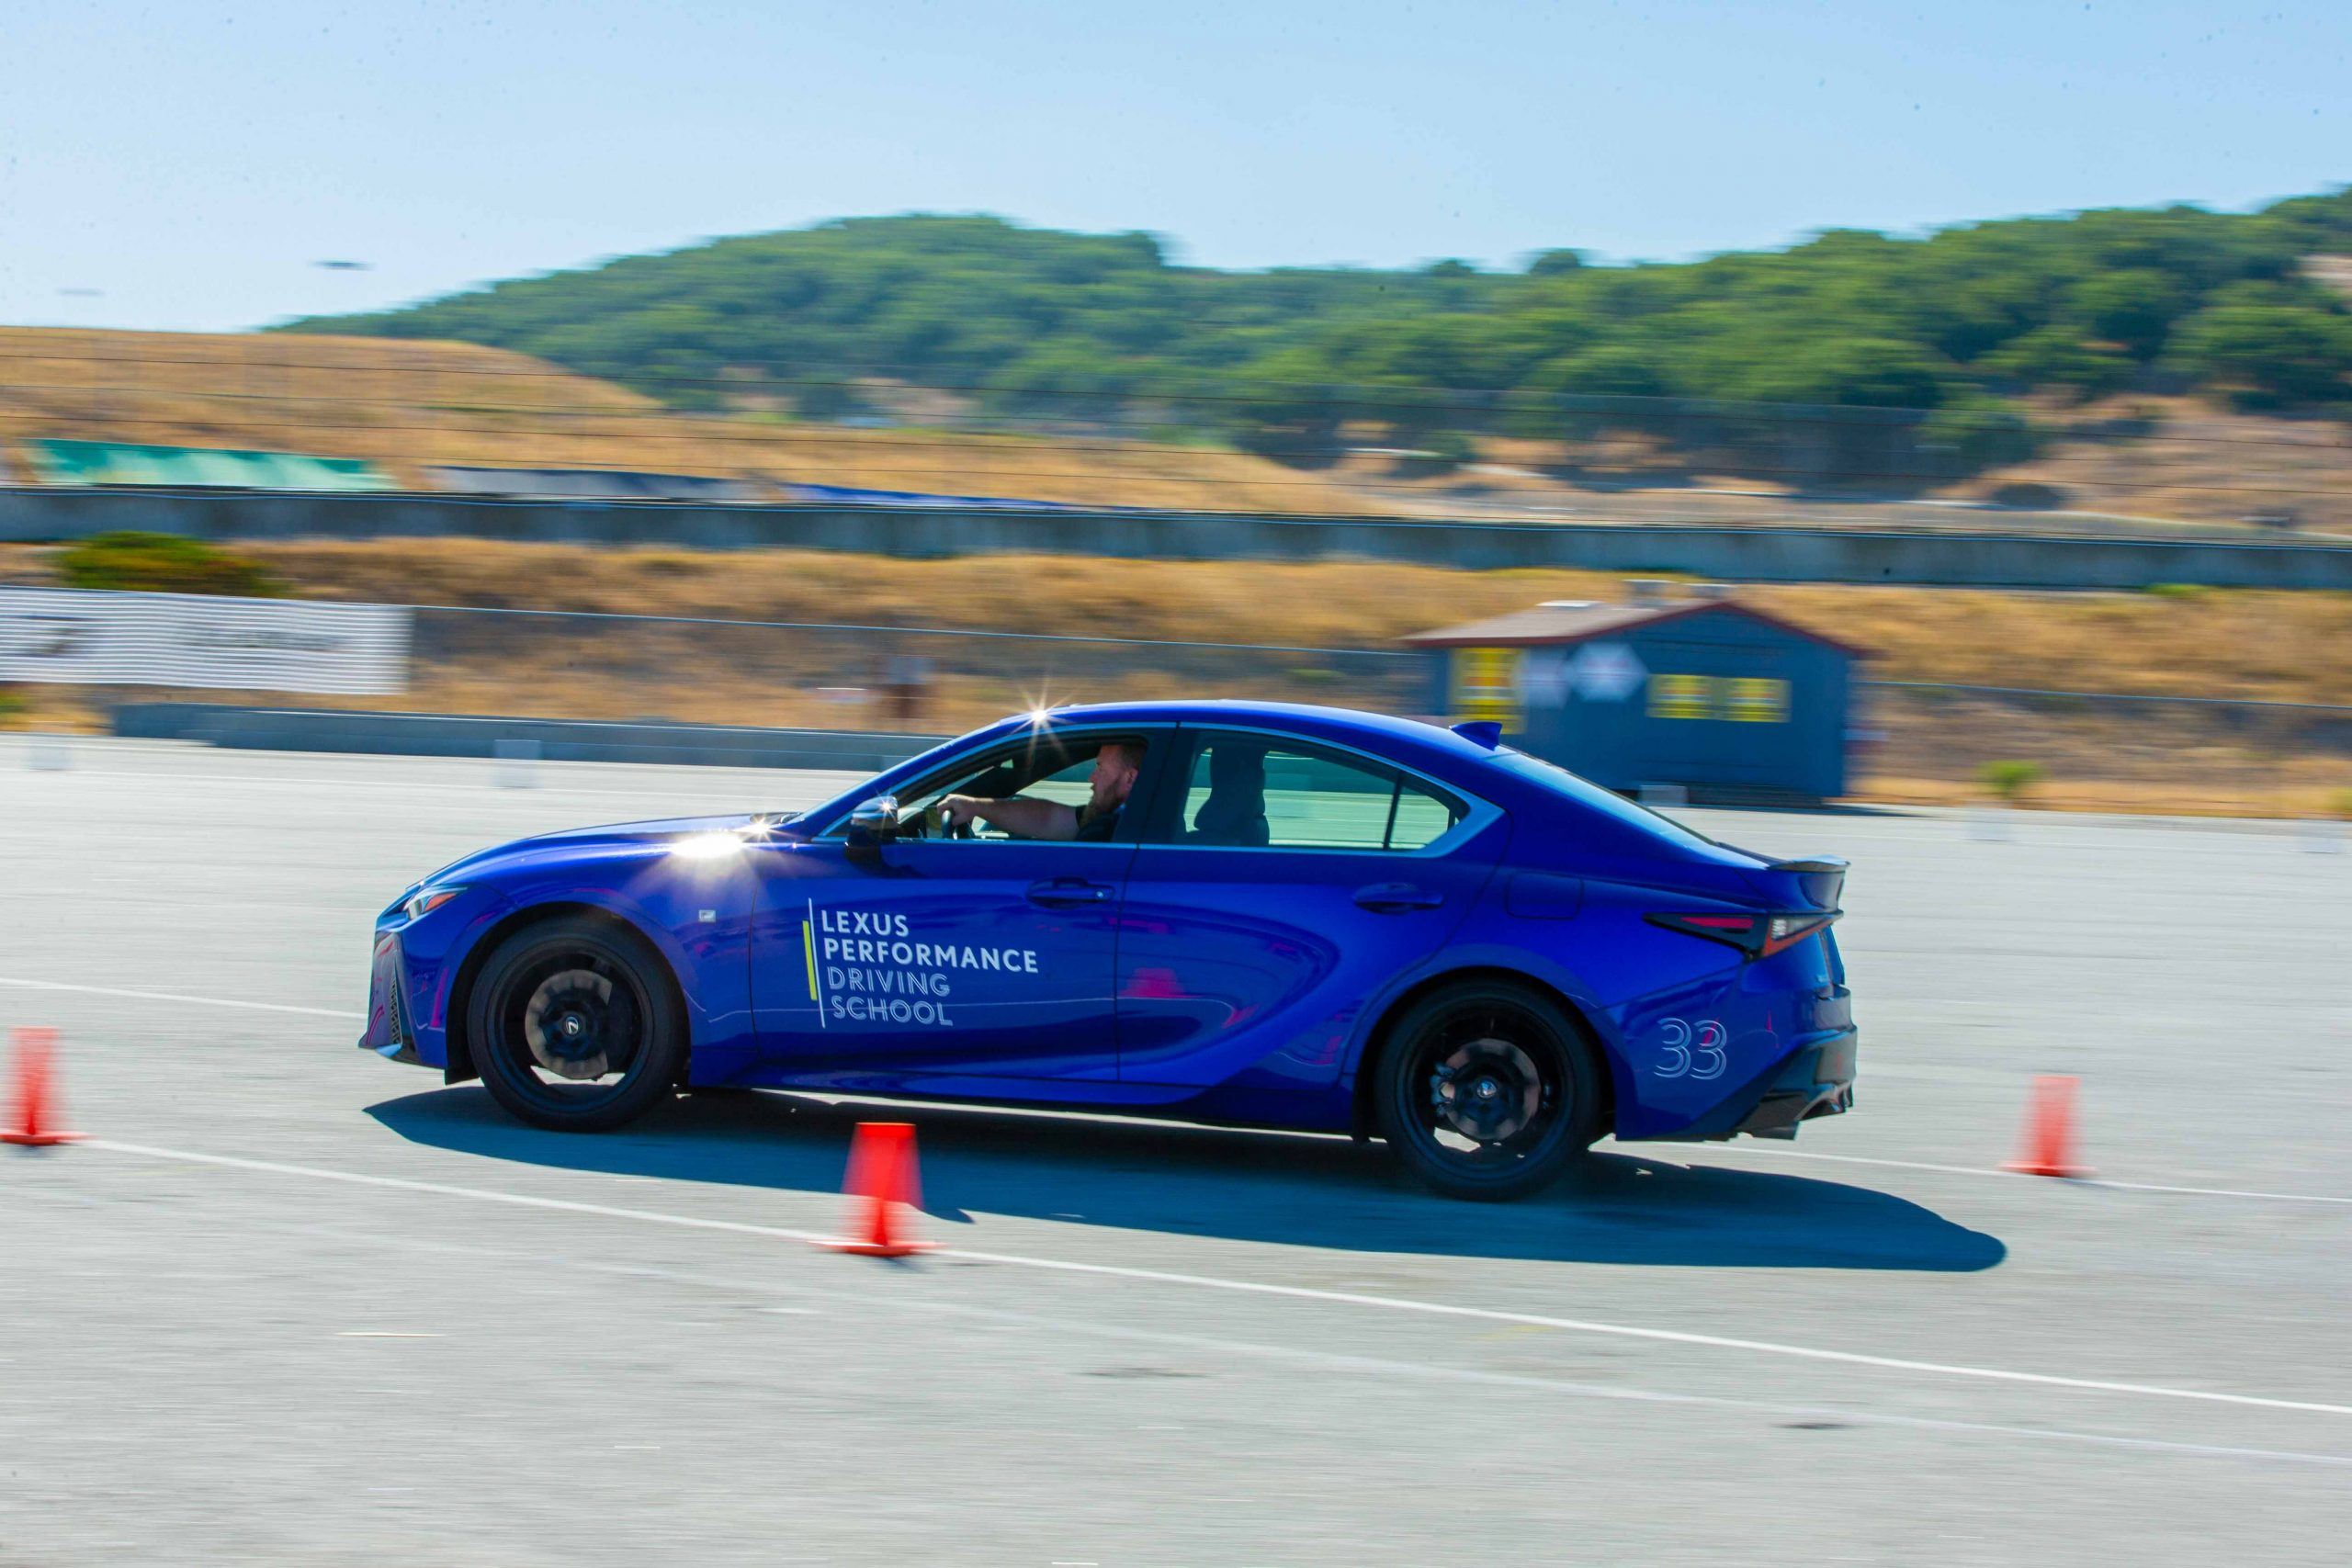 autocross Lexus Performance Driving School June 2021 Laguna Seca